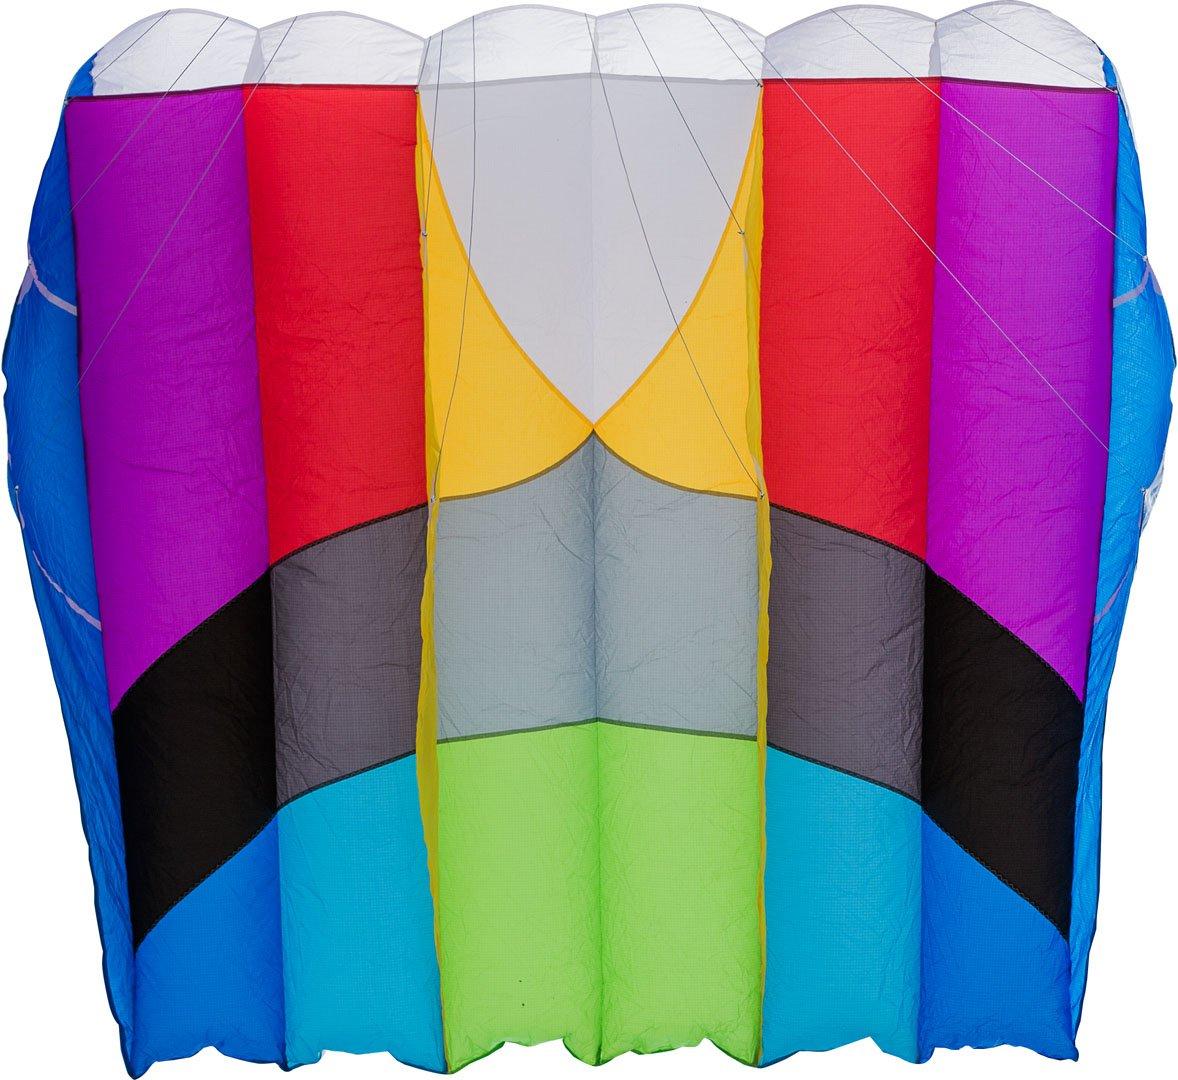 HQ Lenkdrachen Single Line Kites KAP Foil 3.0 Drachen Freizeit Spaß